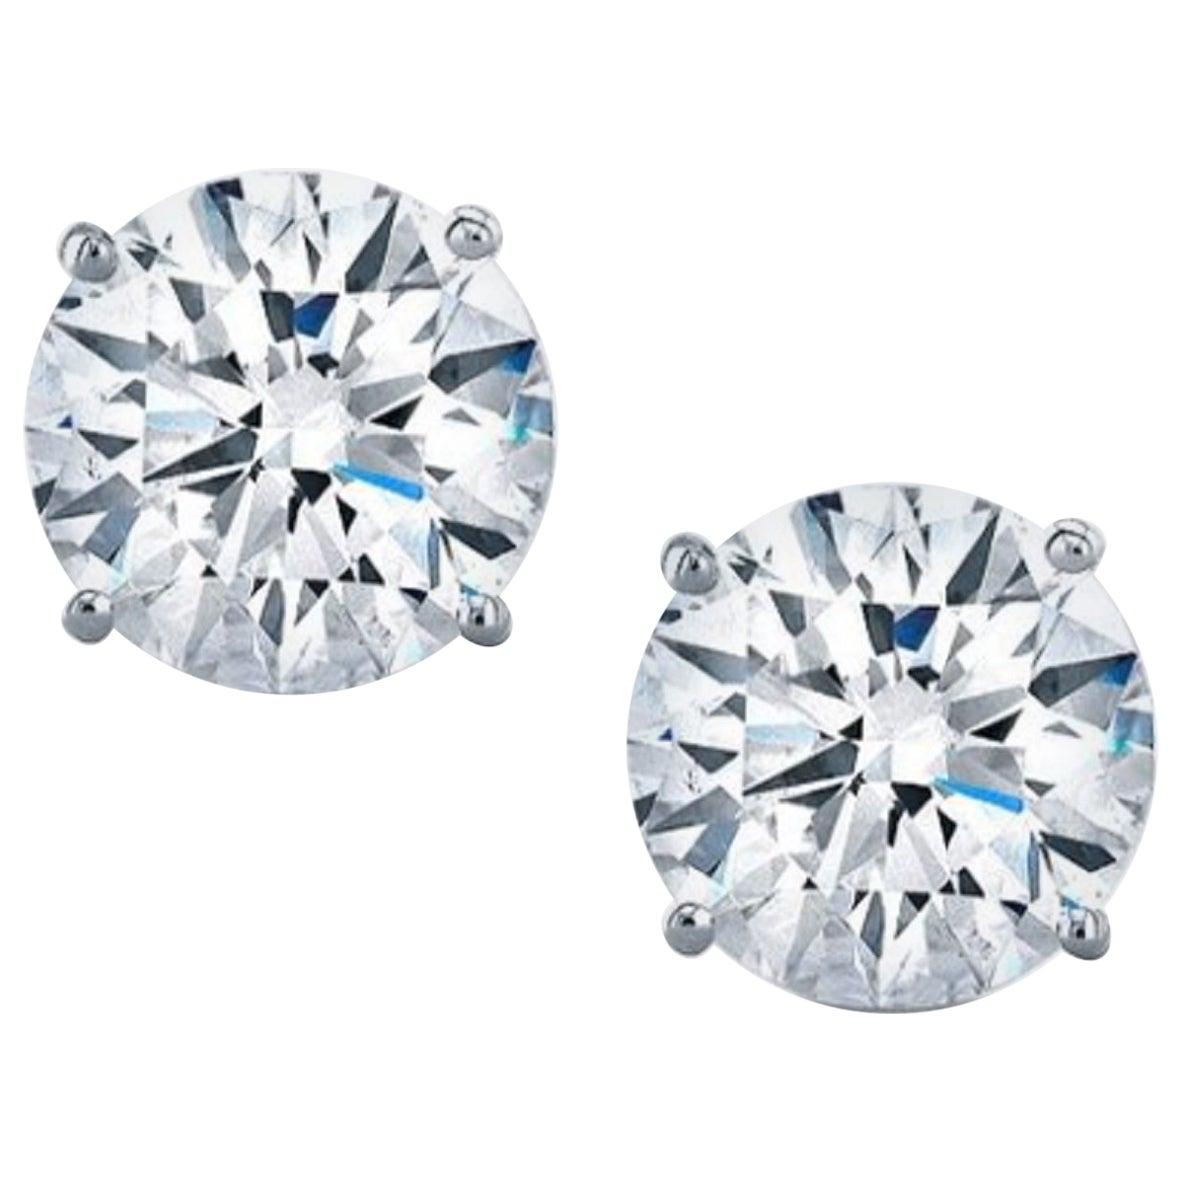 GIA Certified 3.00 Carat Round Brilliant Cut Diamond INTERNALLY FLAWLESS/VVS1